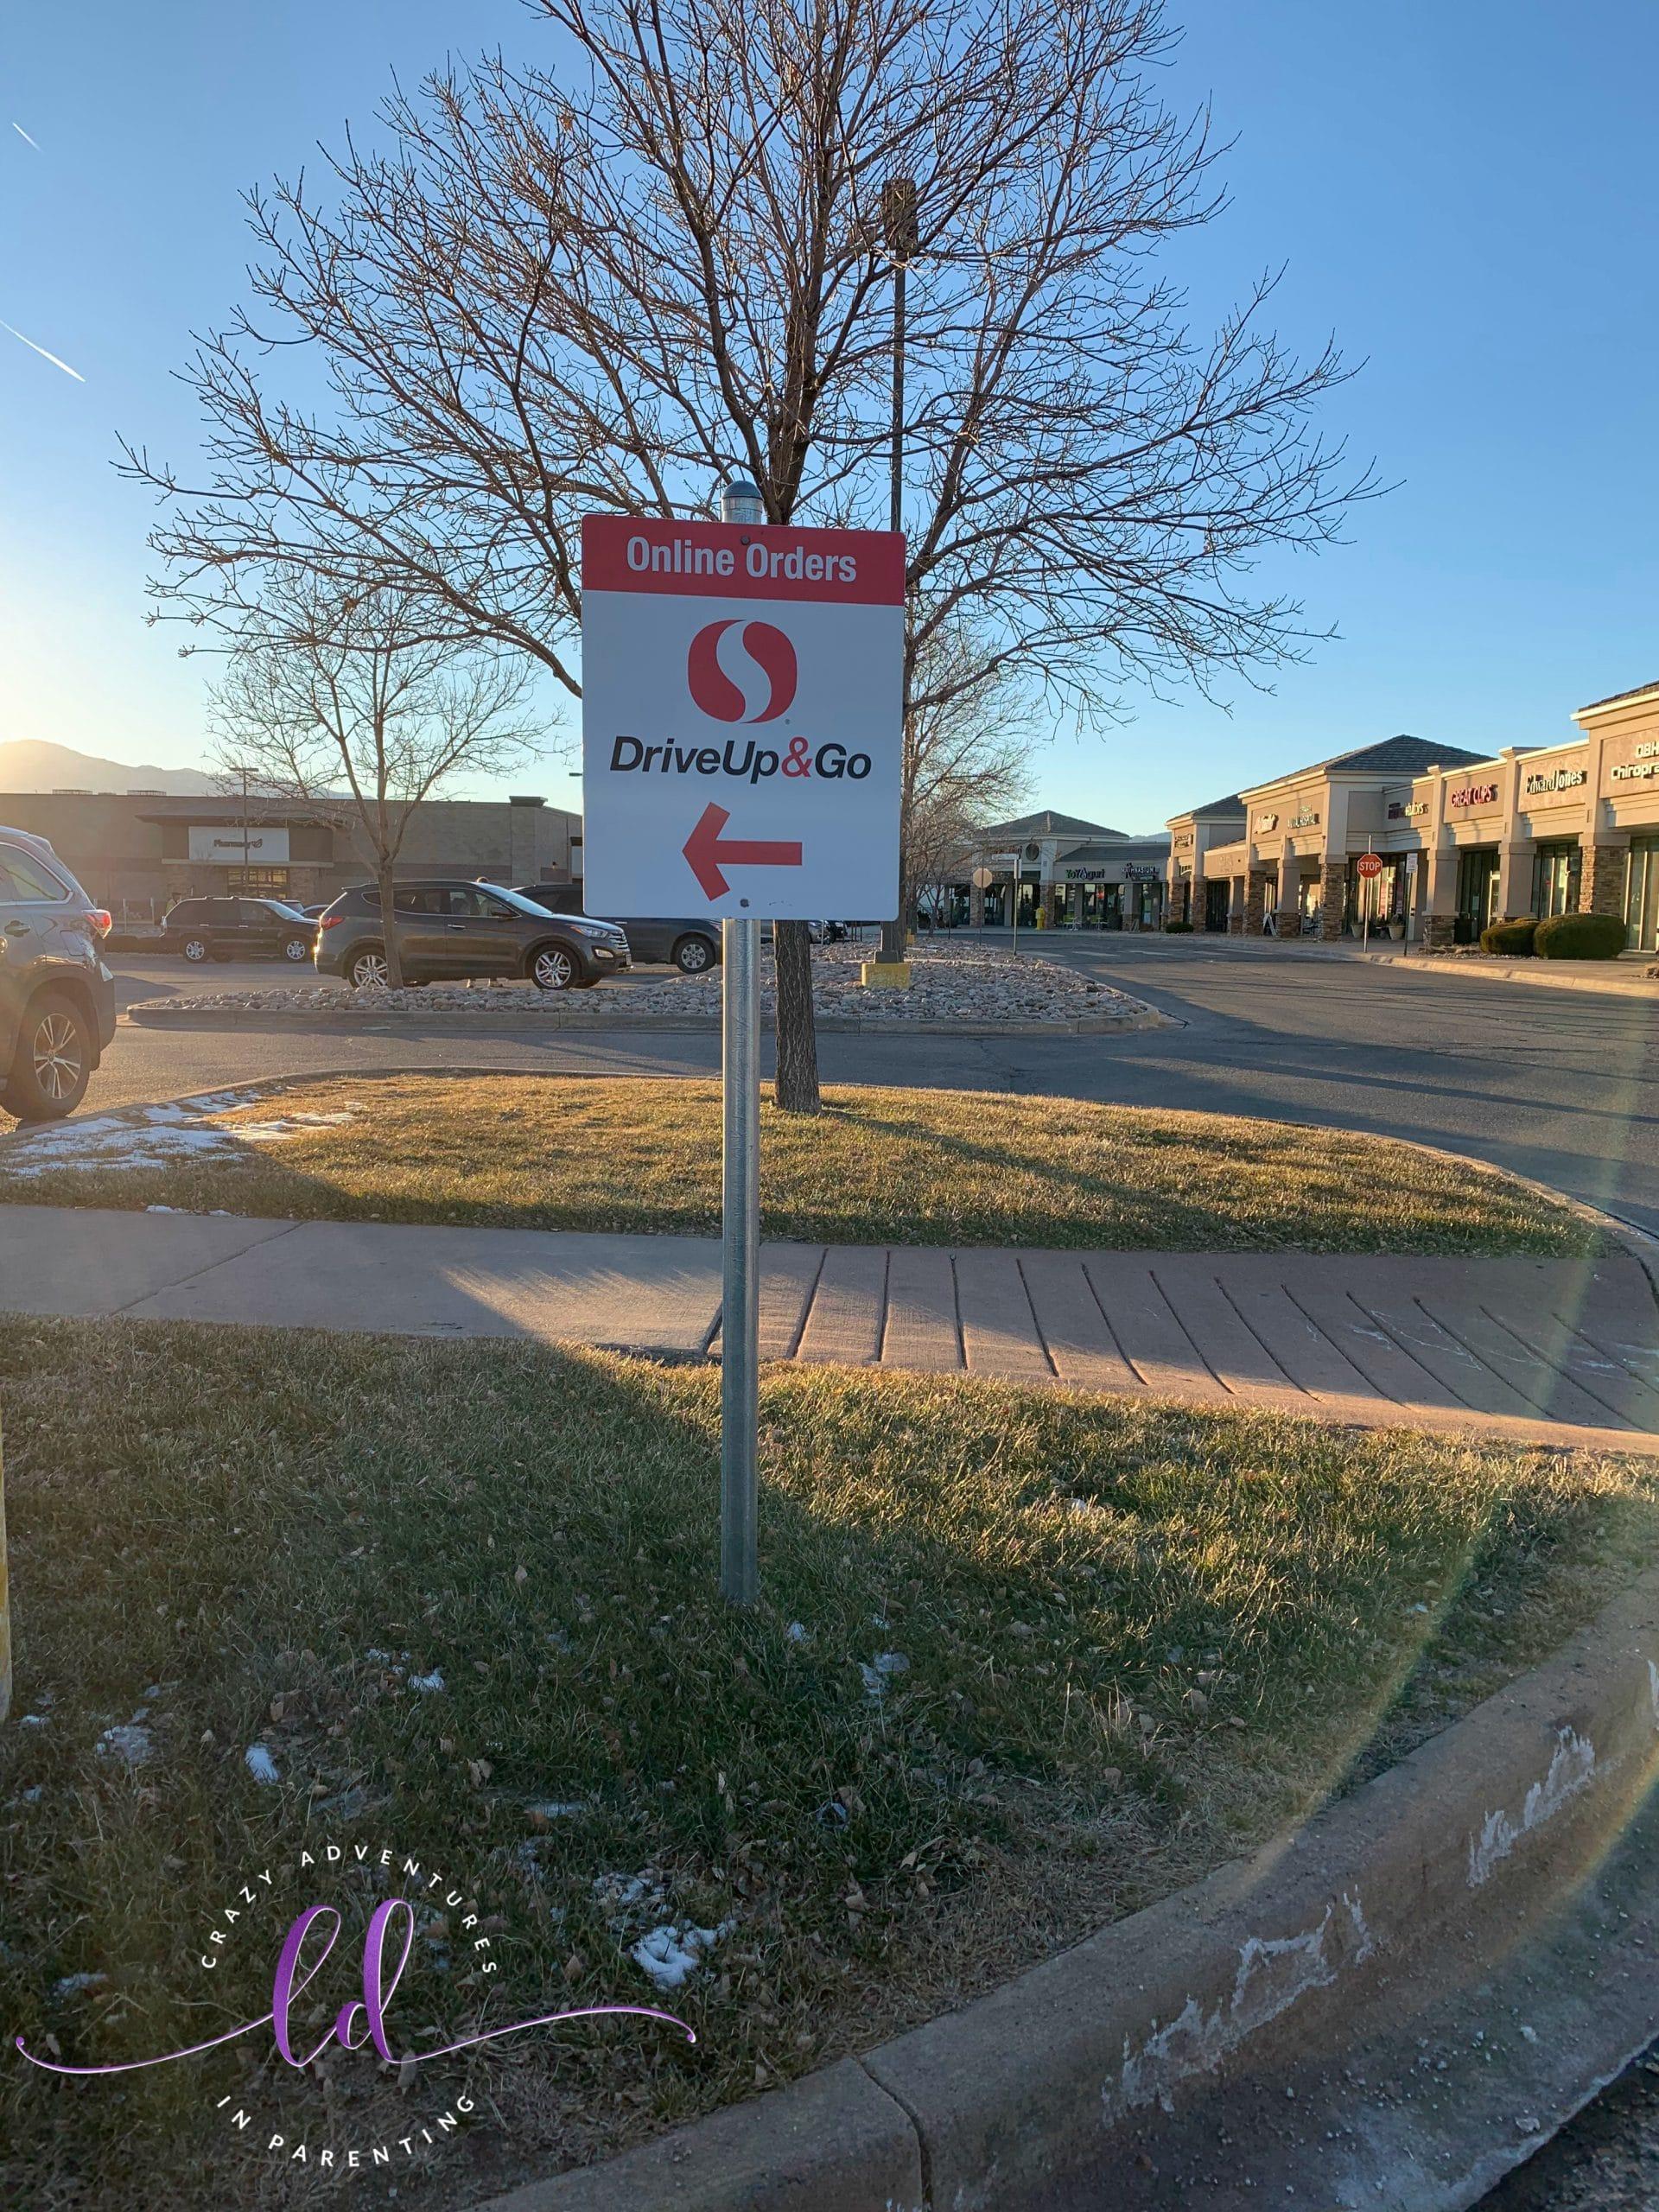 Safeway Drive Up & Go signage